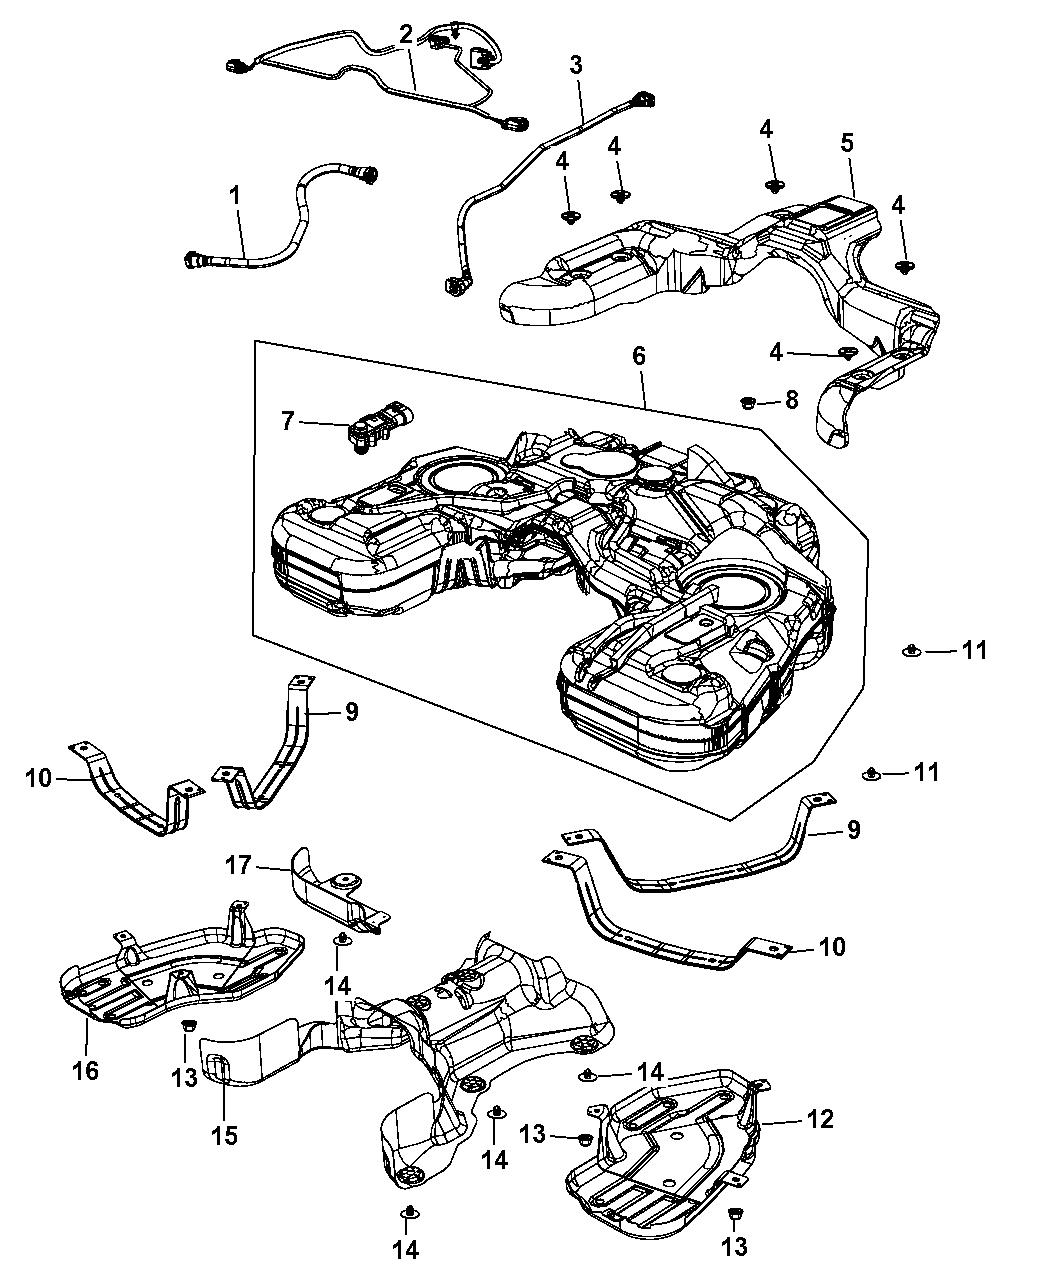 Dodge Durango Fuel Tank